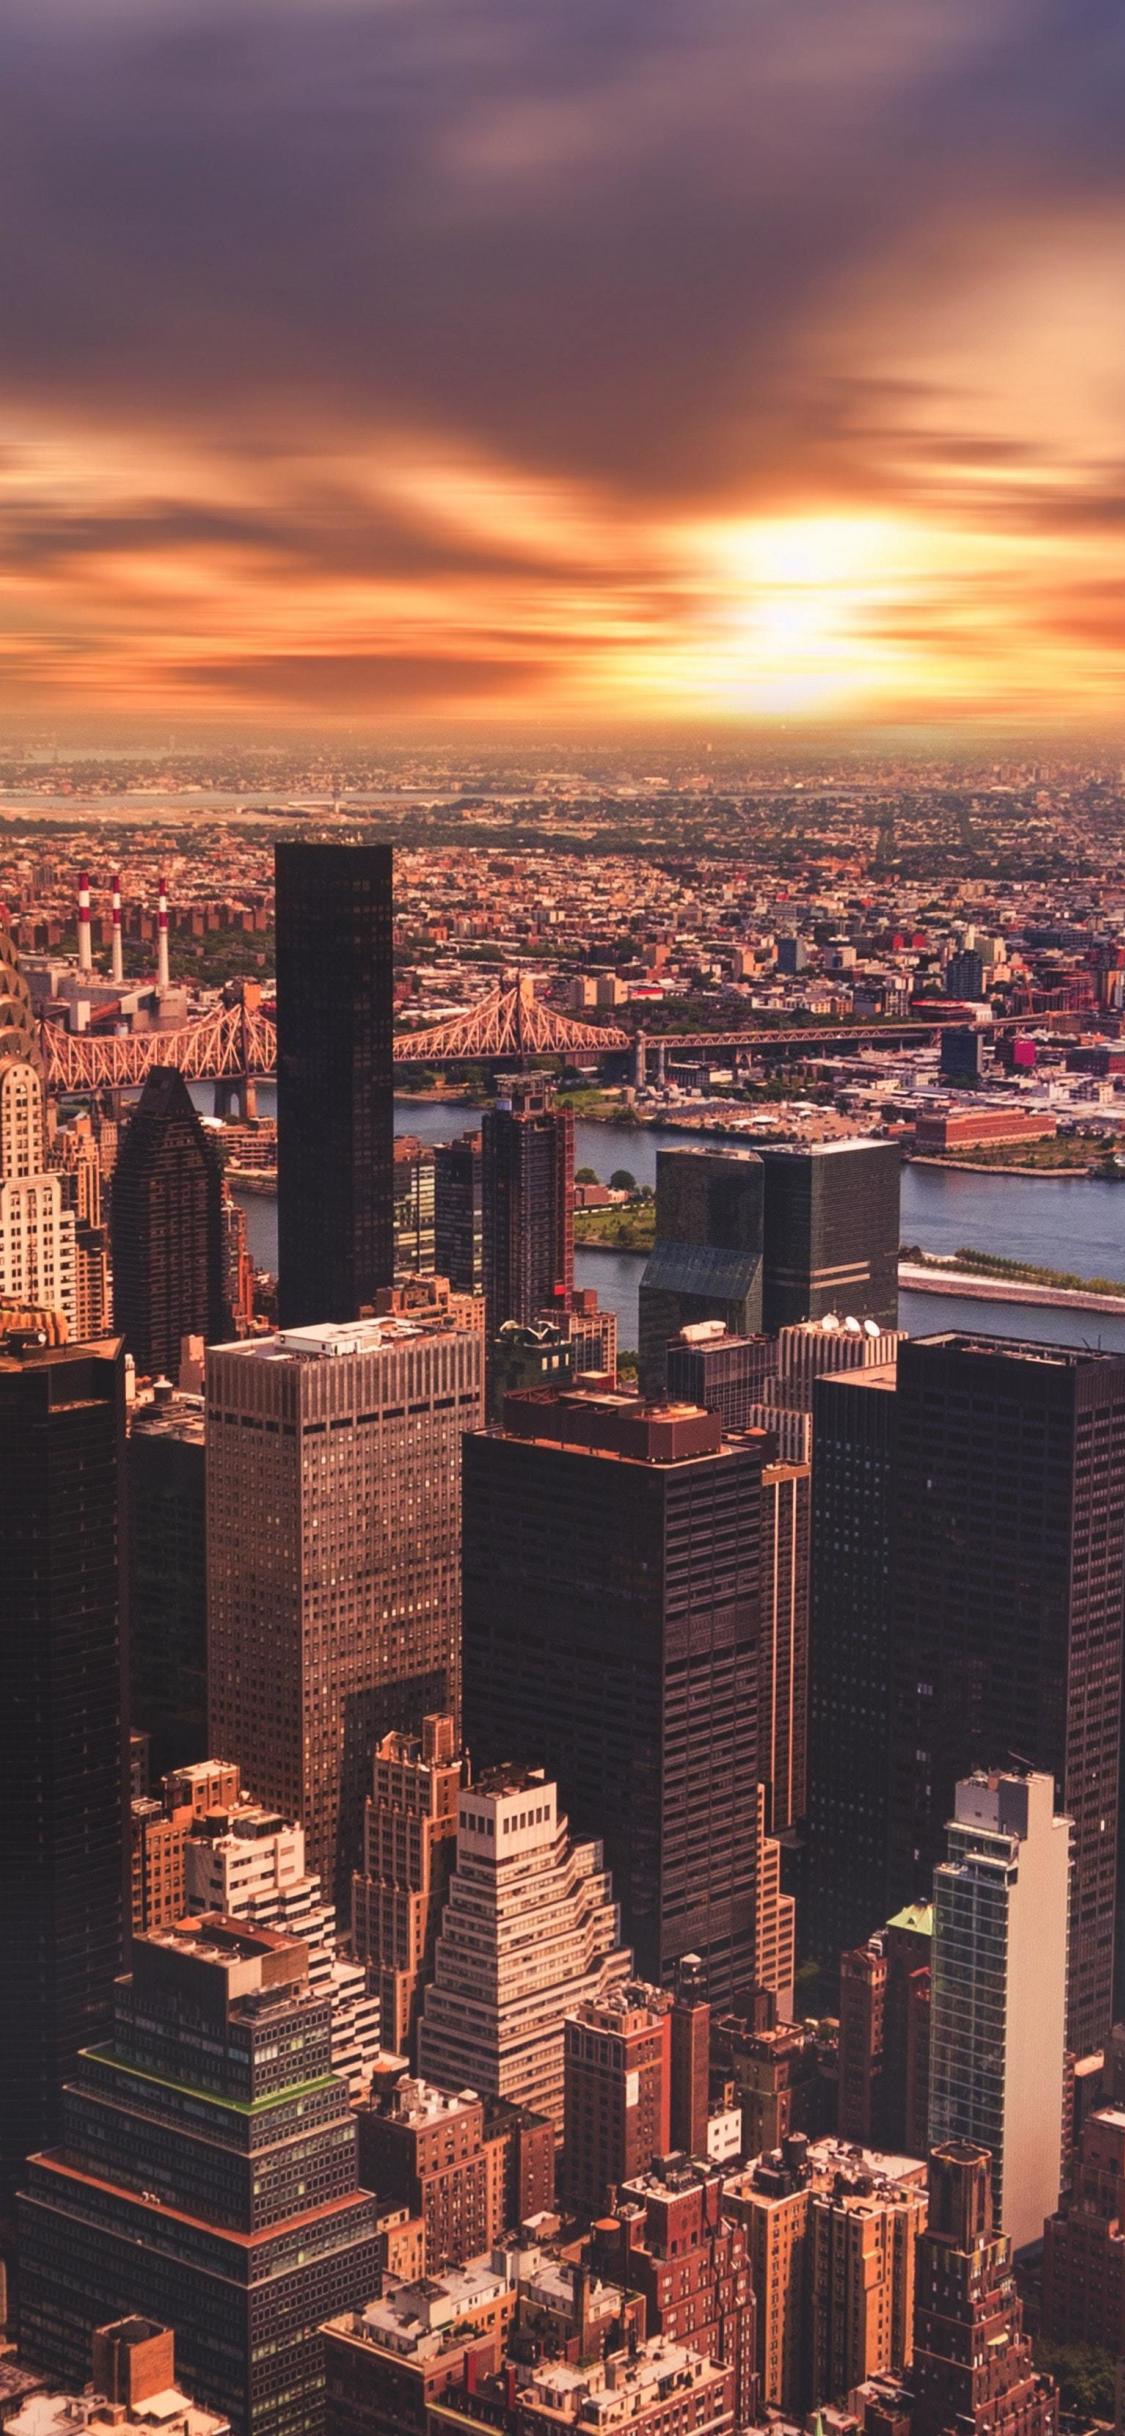 Download 1125x2436 Wallpaper New York Skysrapers Cityscape Sunset